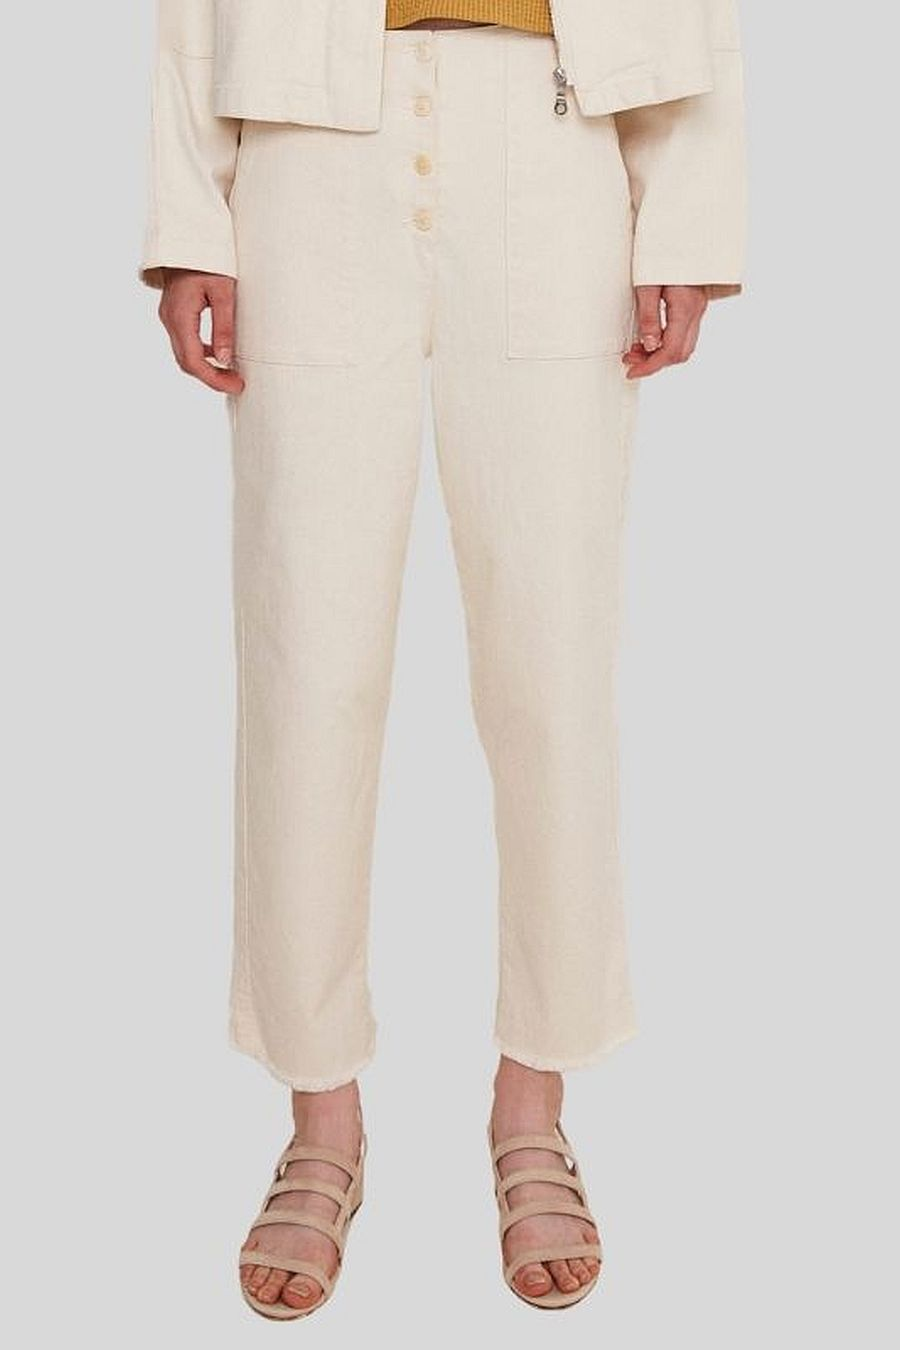 Rita Row  Enna Jeans